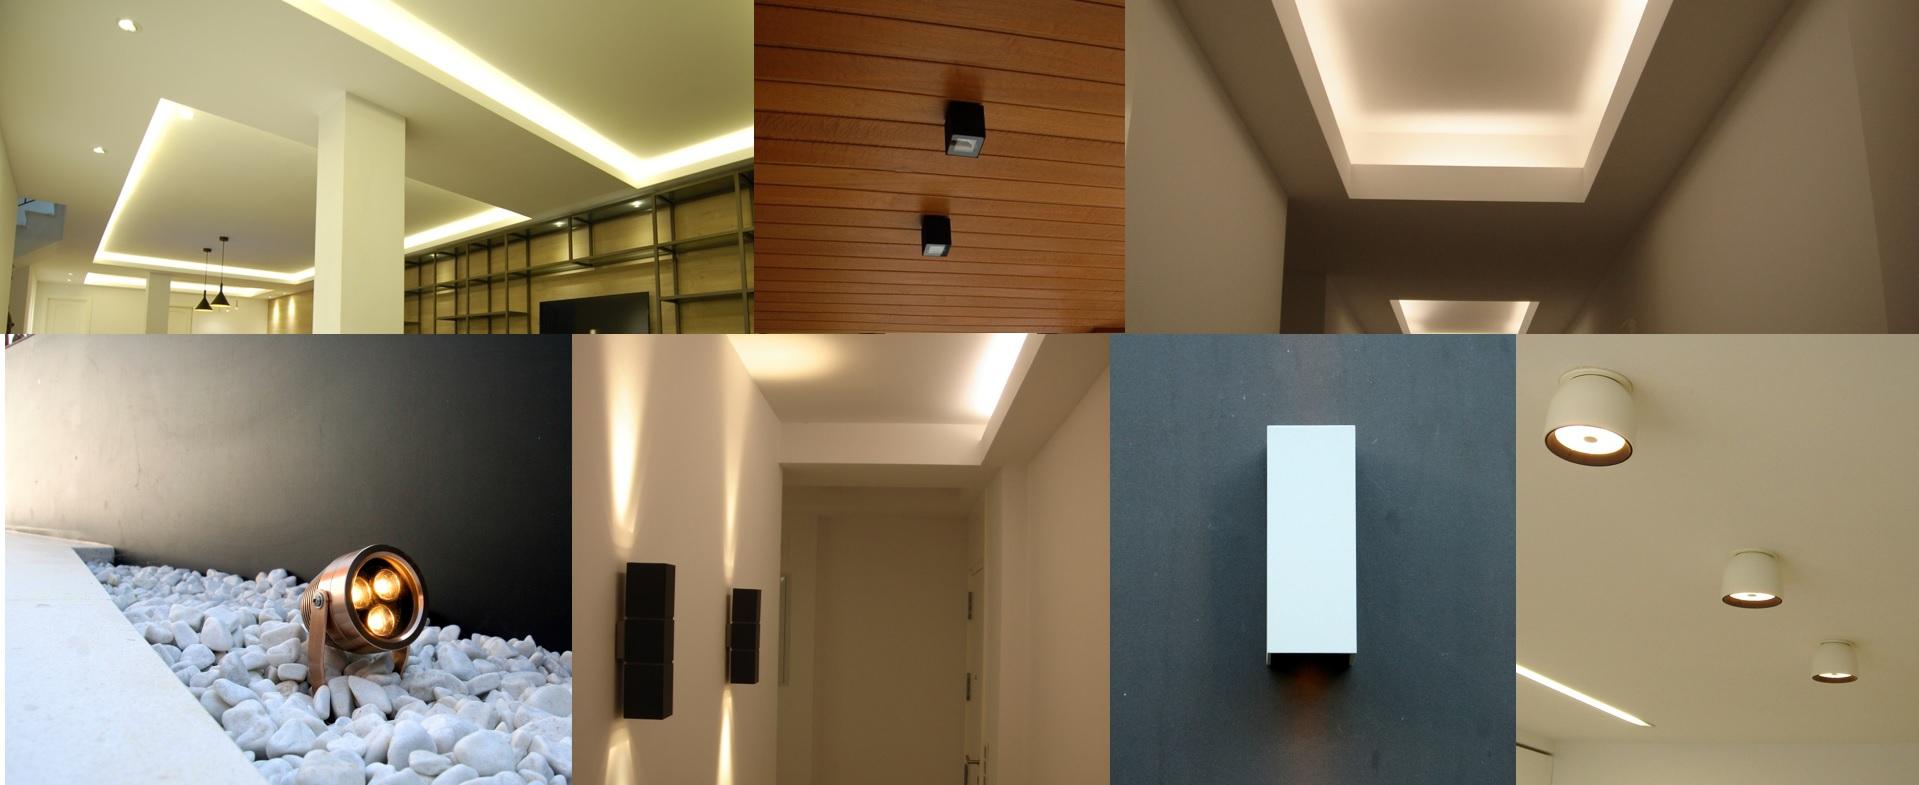 smart home cadiz, iluminacion cadiz, domotica cadiz